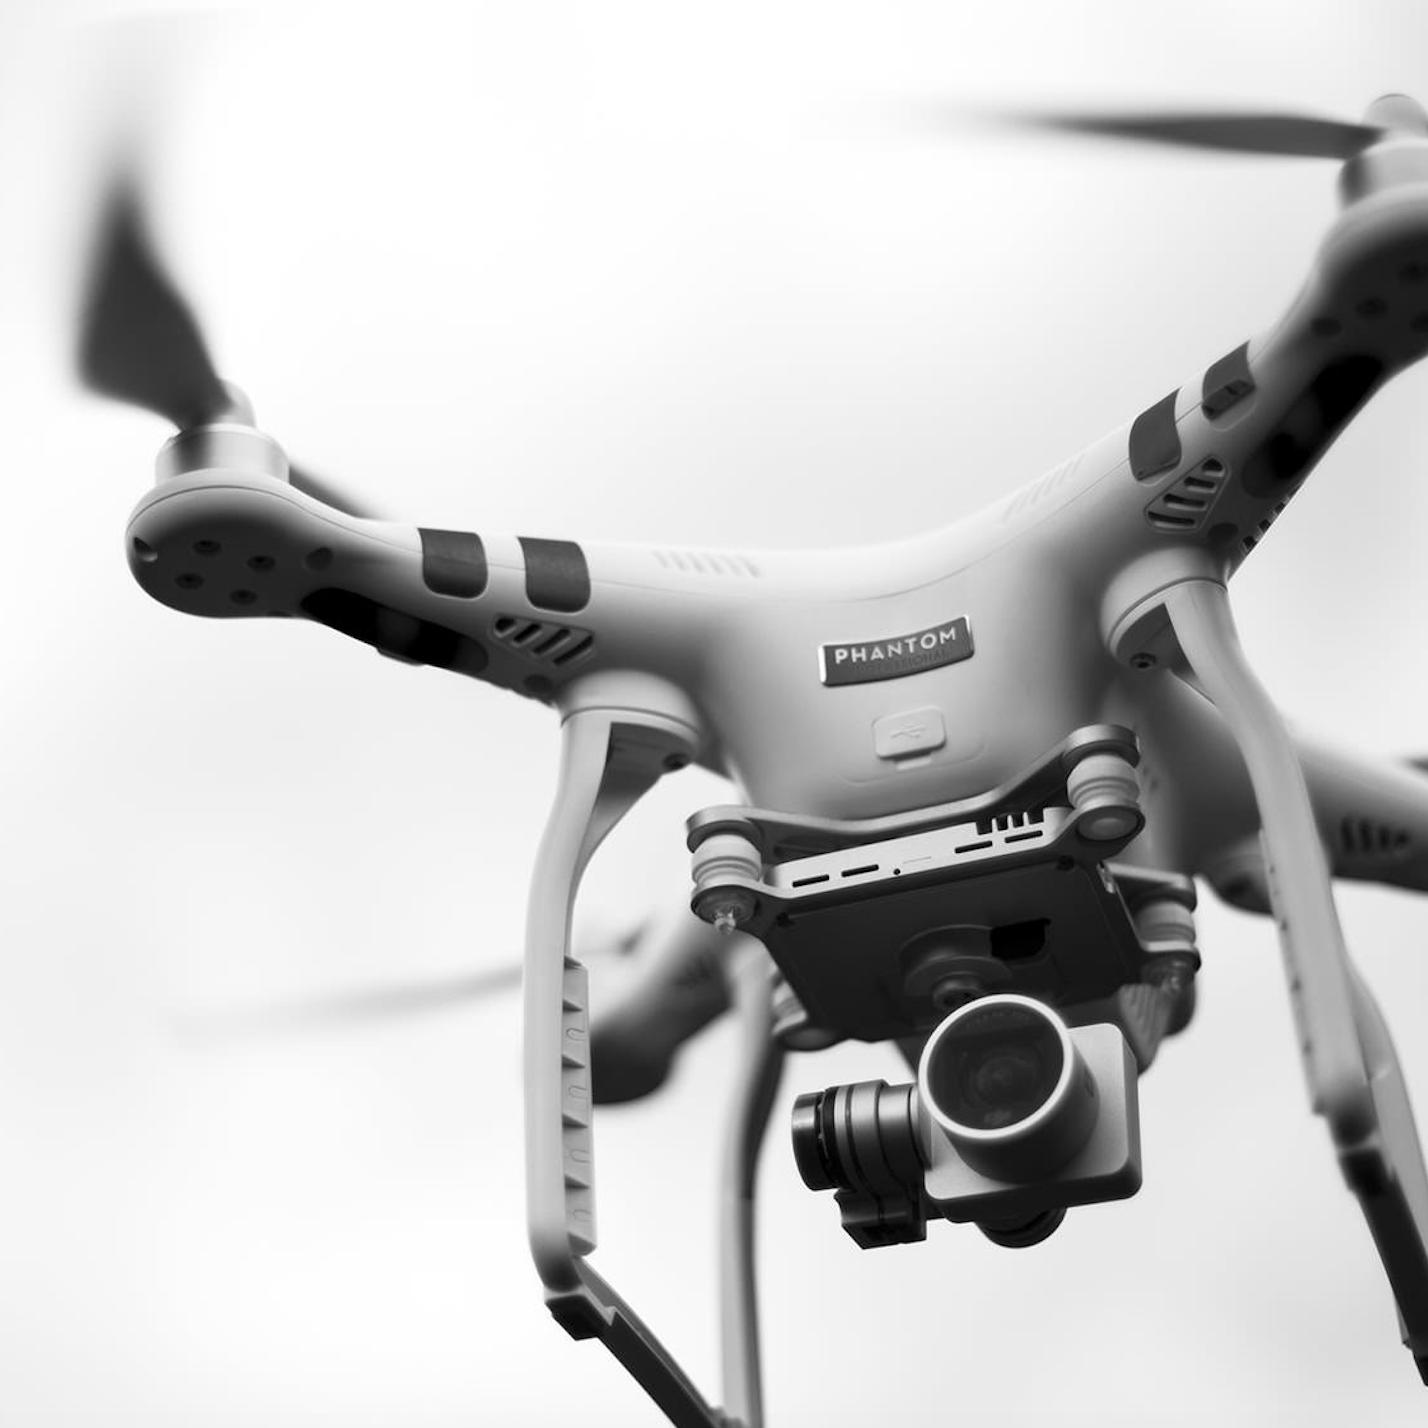 Premier Envol – DroneDJI PHANTOM 3 PRO